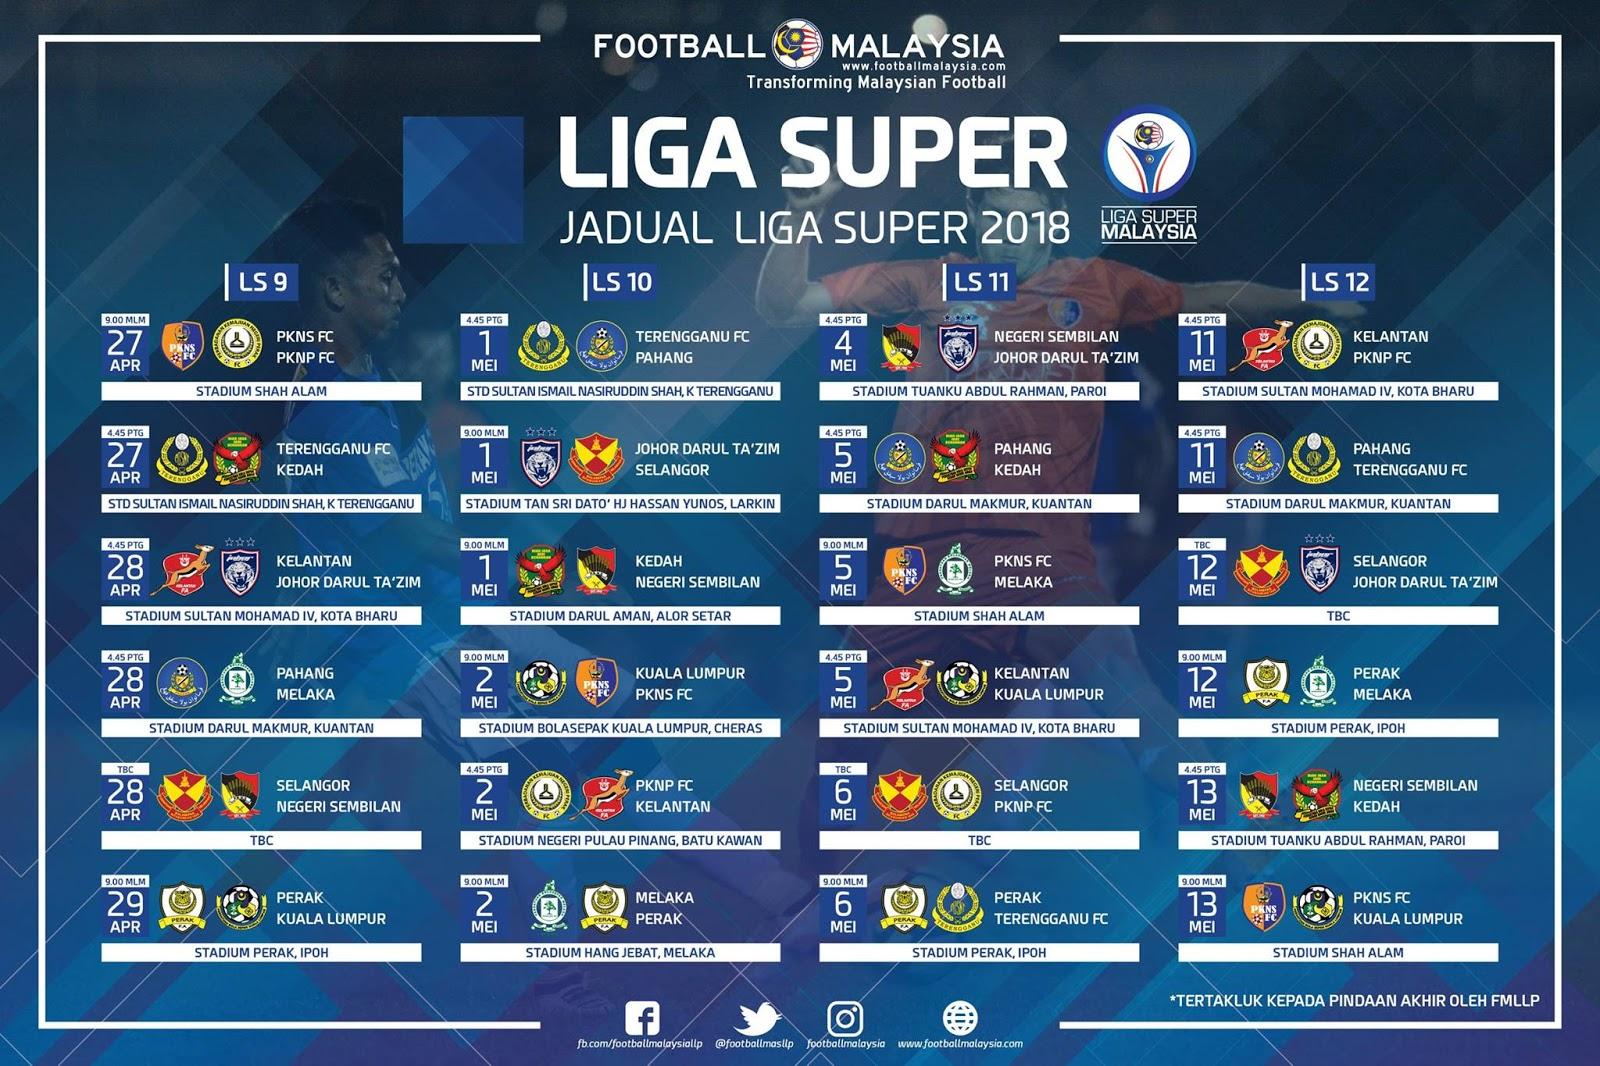 Jadual Perlawanan Liga Super Dan Liga Perdana Malaysia Musim 2018 Travel Eat Lifestyle Blog